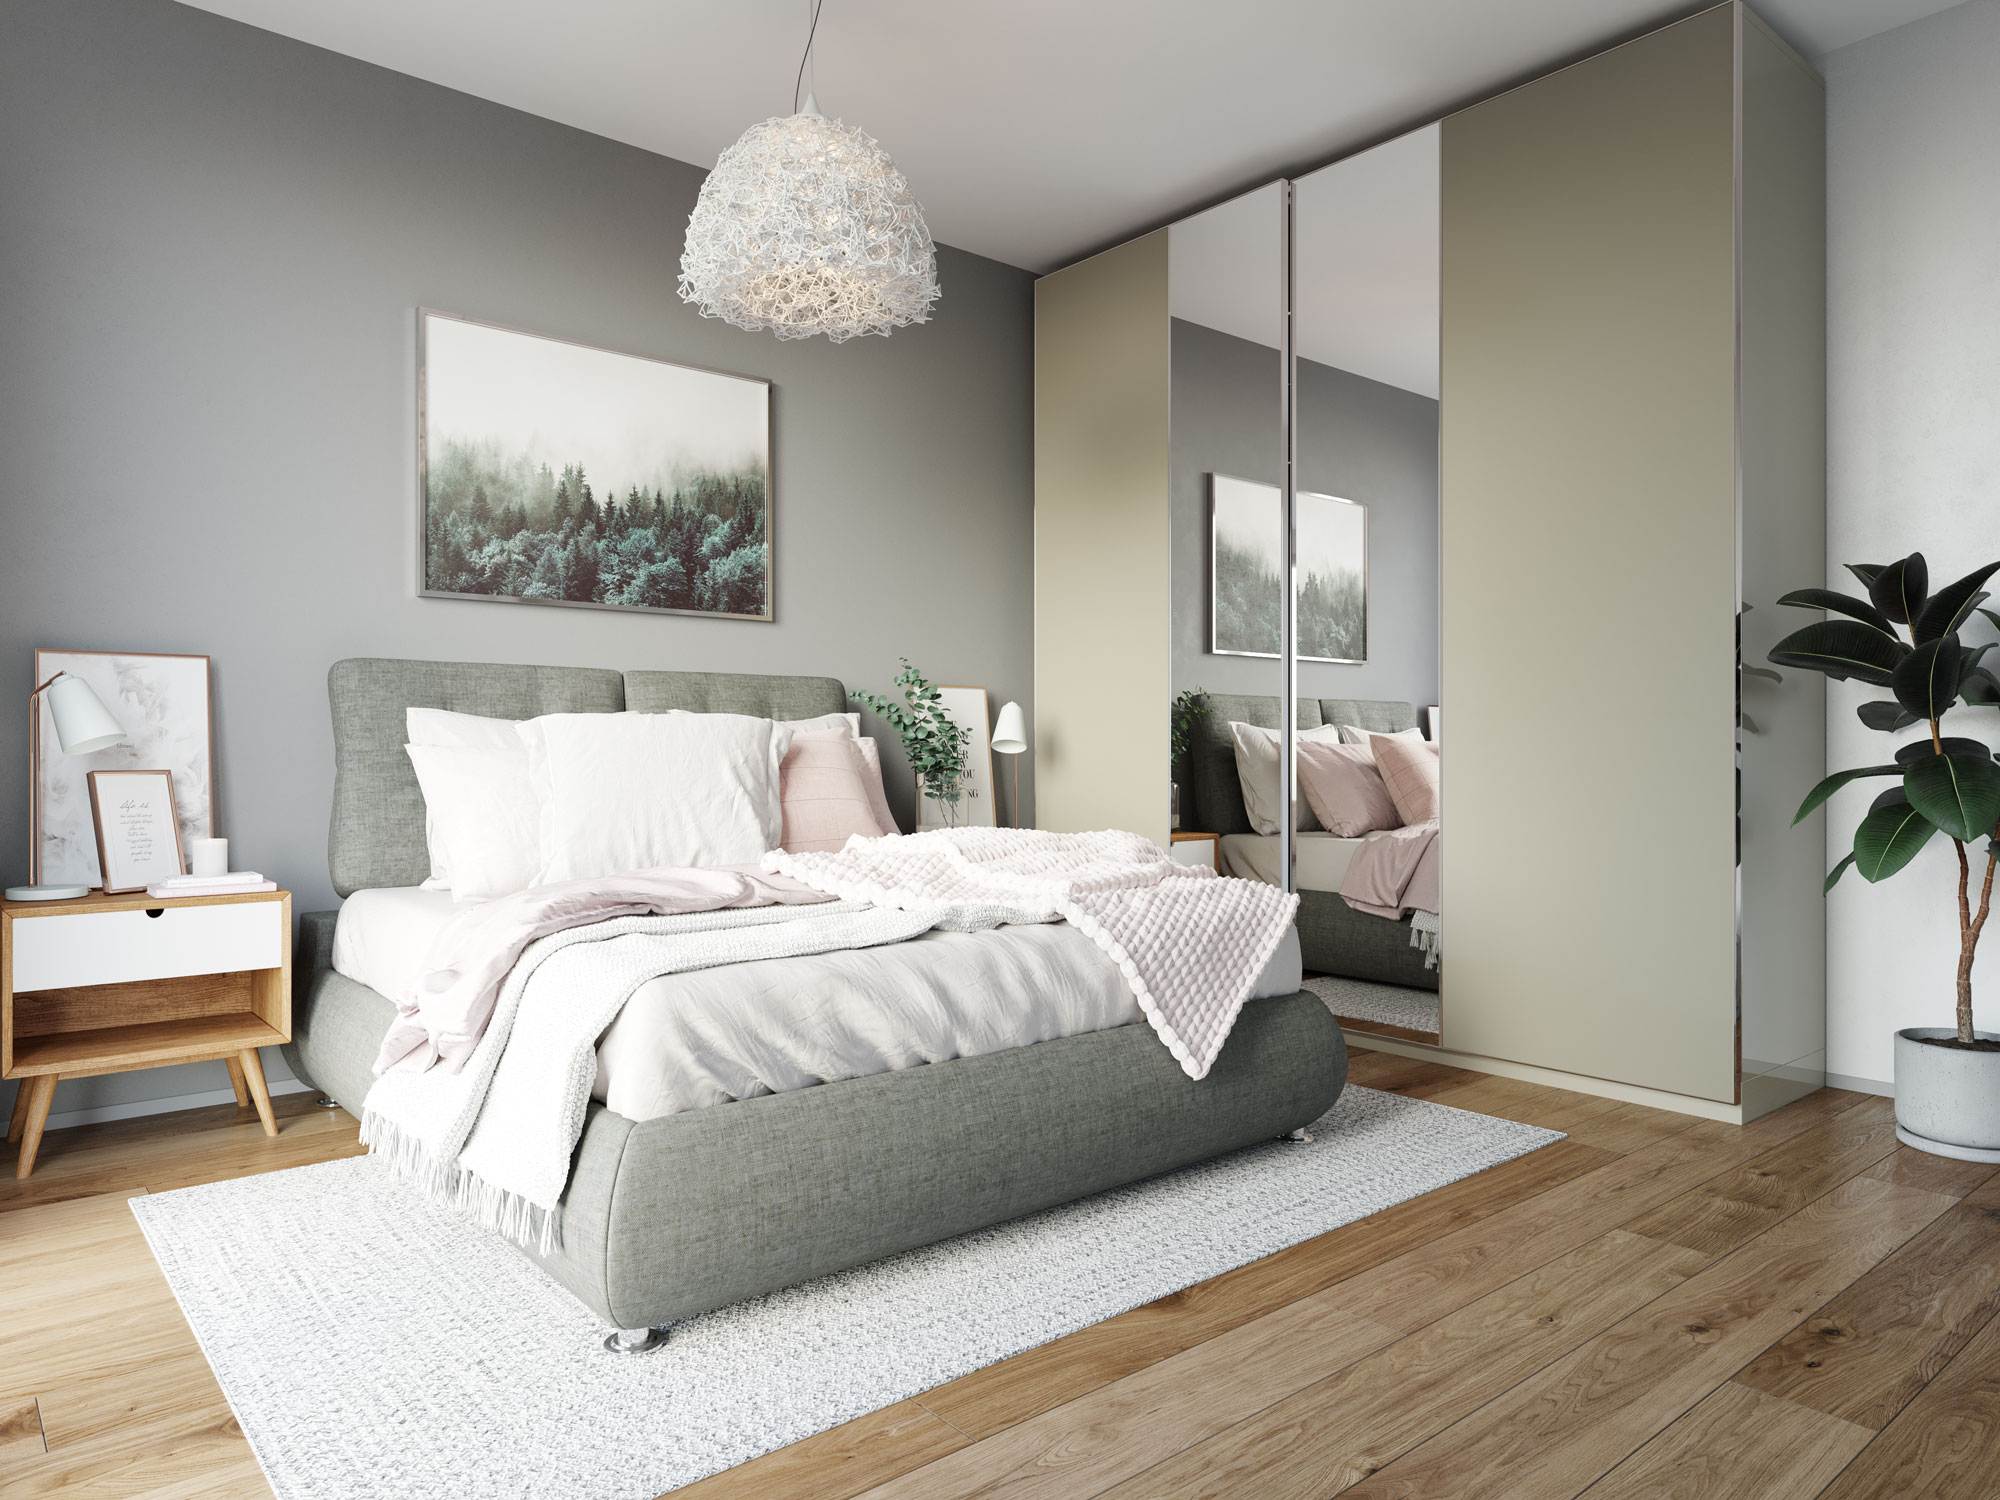 Dormitor - Vilă premium Boreal Plus Constanța